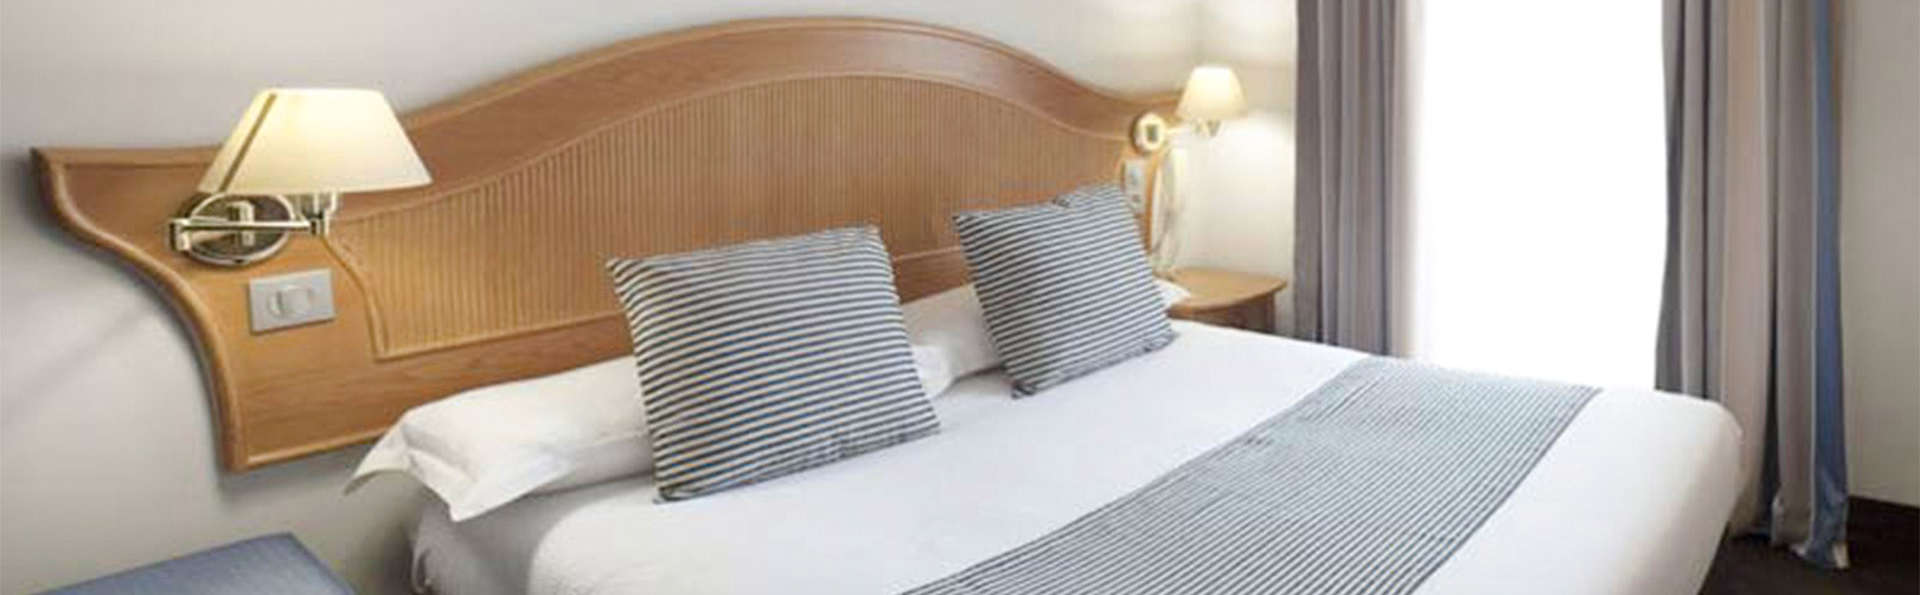 Hôtel Esprit d'Azur - EDIT_BEDROOM_01.jpg